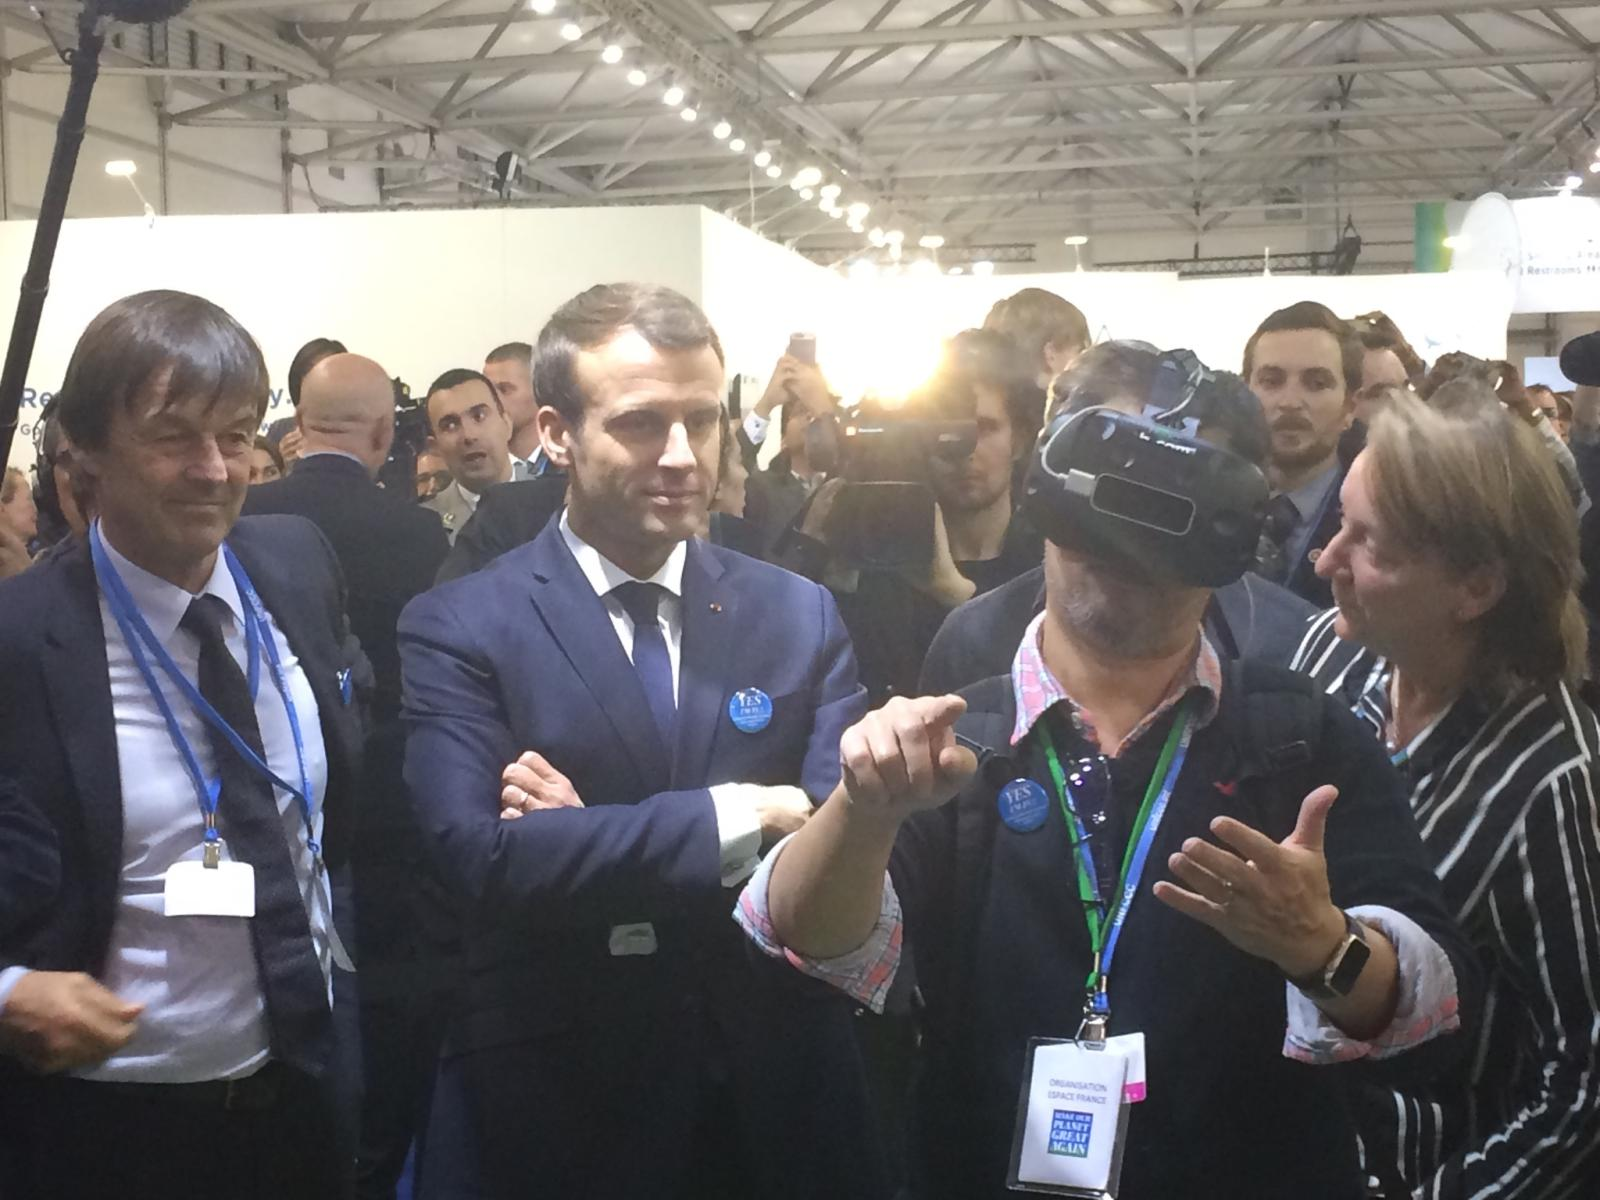 Decouverte-Arctic2100-Oceanopolis_President-Macron_1